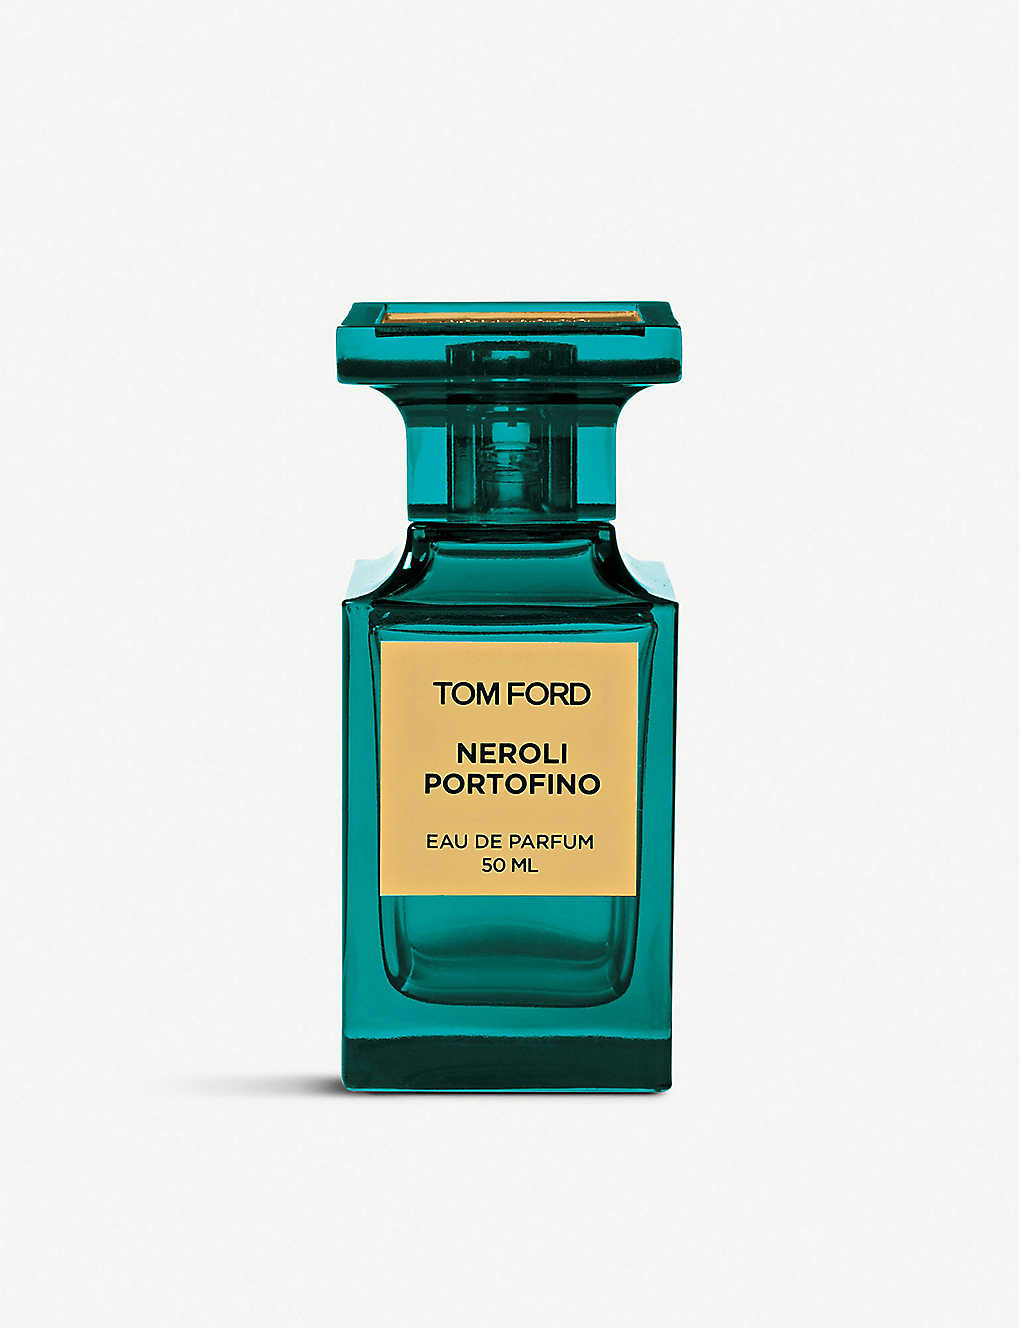 Portofino Spray Parfum Neroli Eau De 50ml edCxrBoW